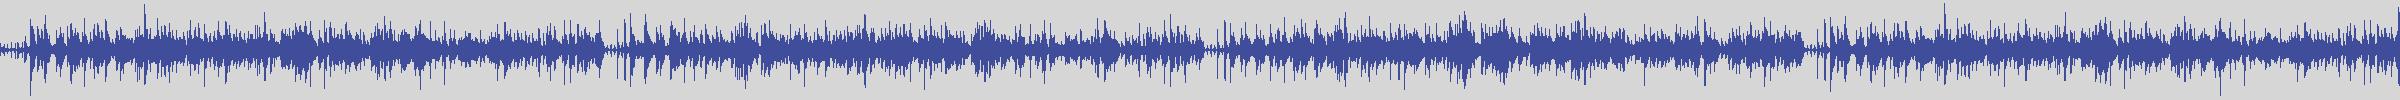 worldwide_music_records [WMR004] Marabou - Don't Tell Me [Original Mix] audio wave form